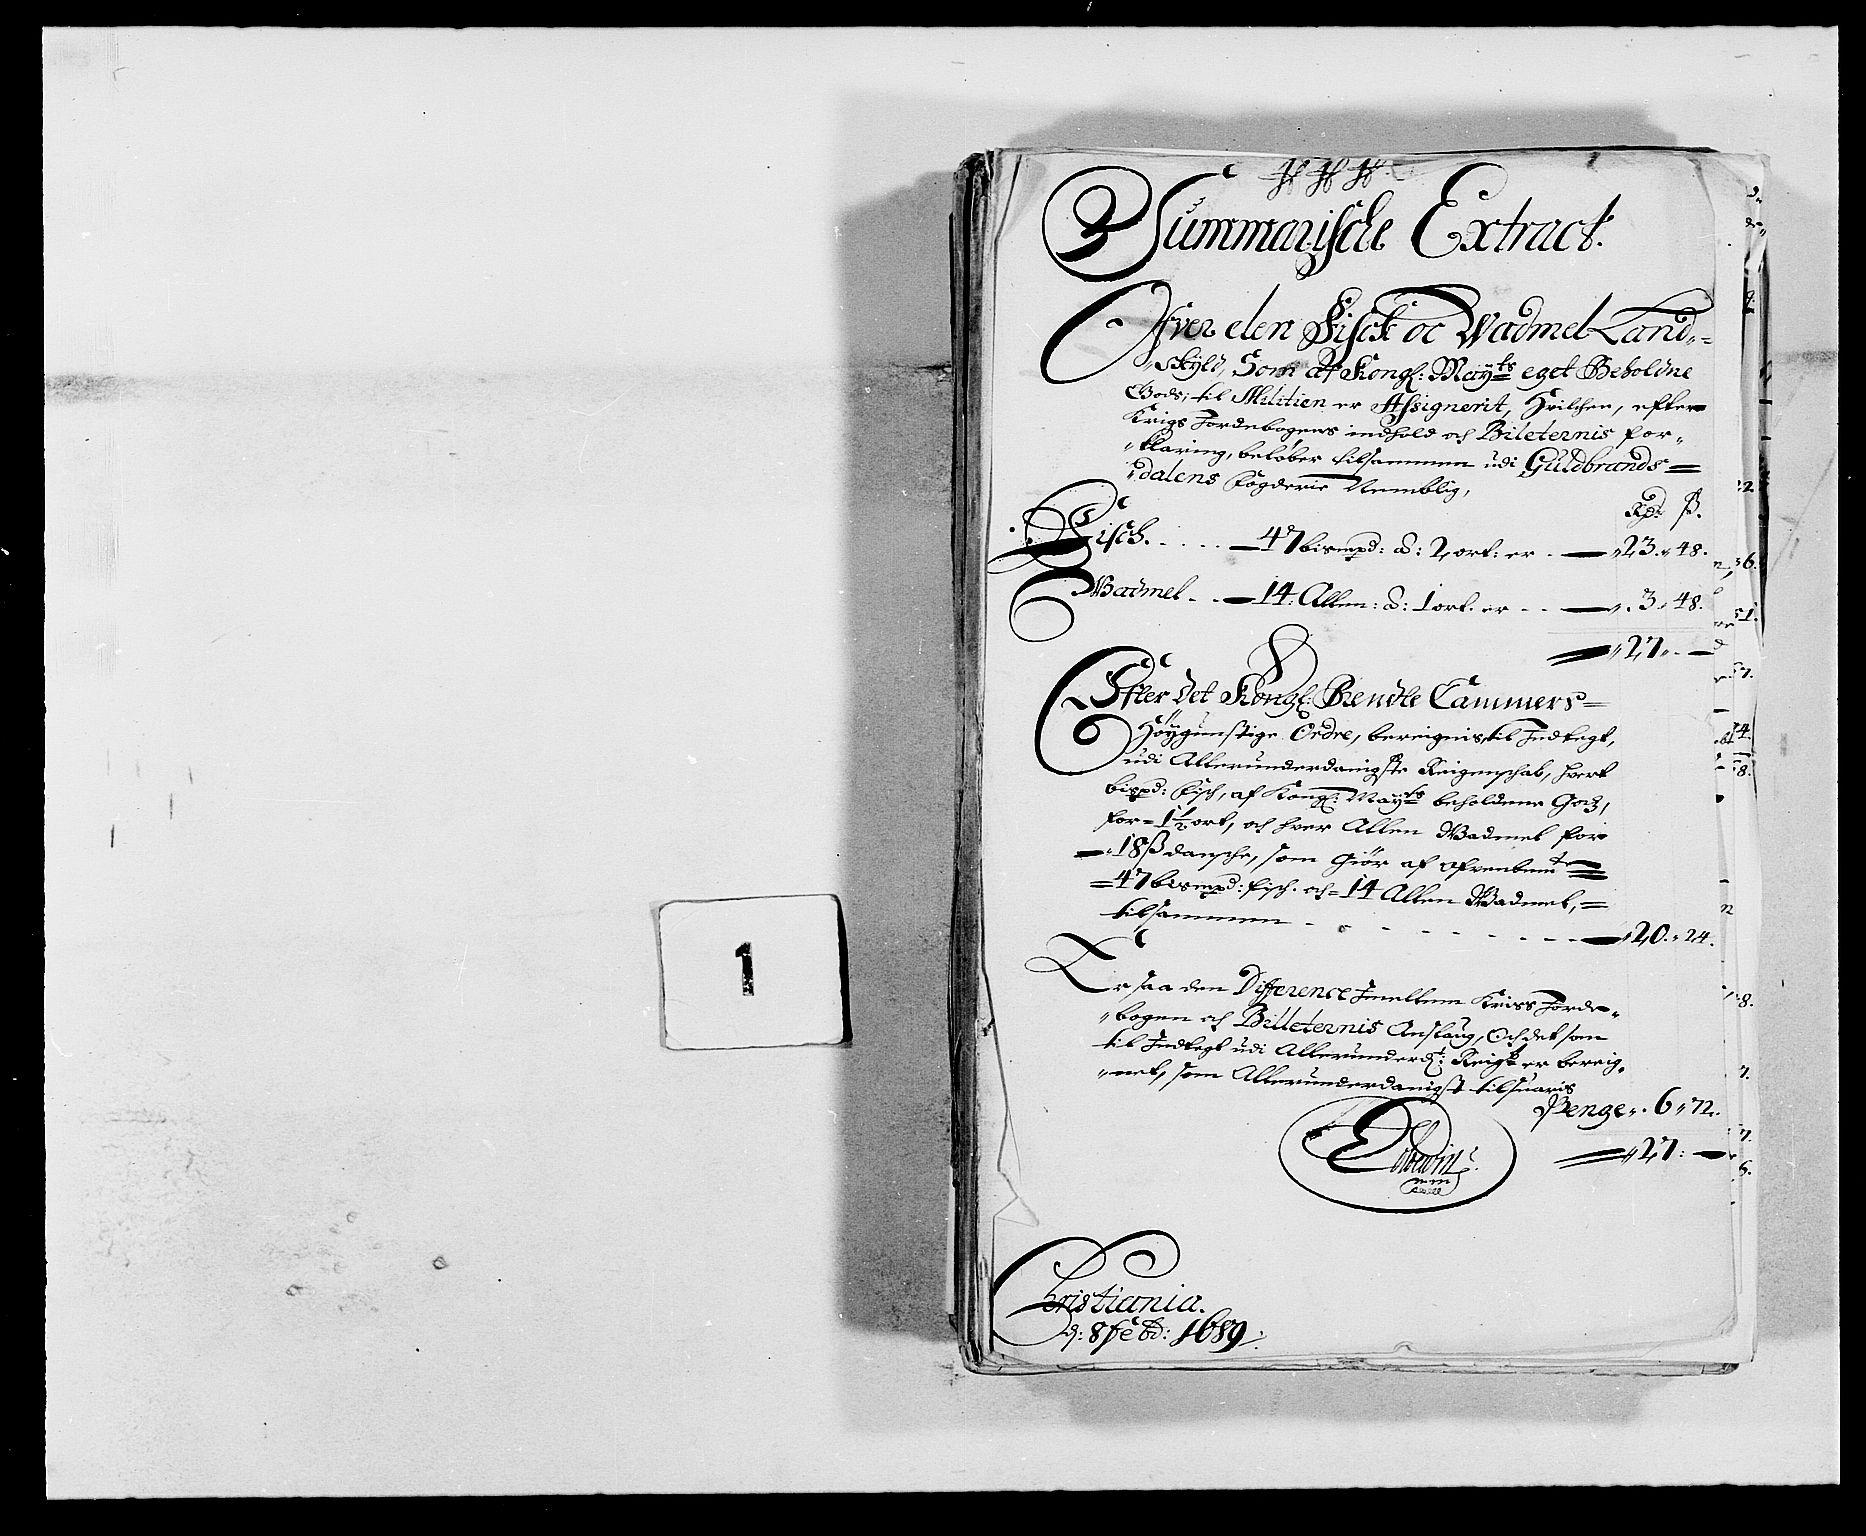 RA, Rentekammeret inntil 1814, Reviderte regnskaper, Fogderegnskap, R17/L1164: Fogderegnskap Gudbrandsdal, 1682-1689, s. 30